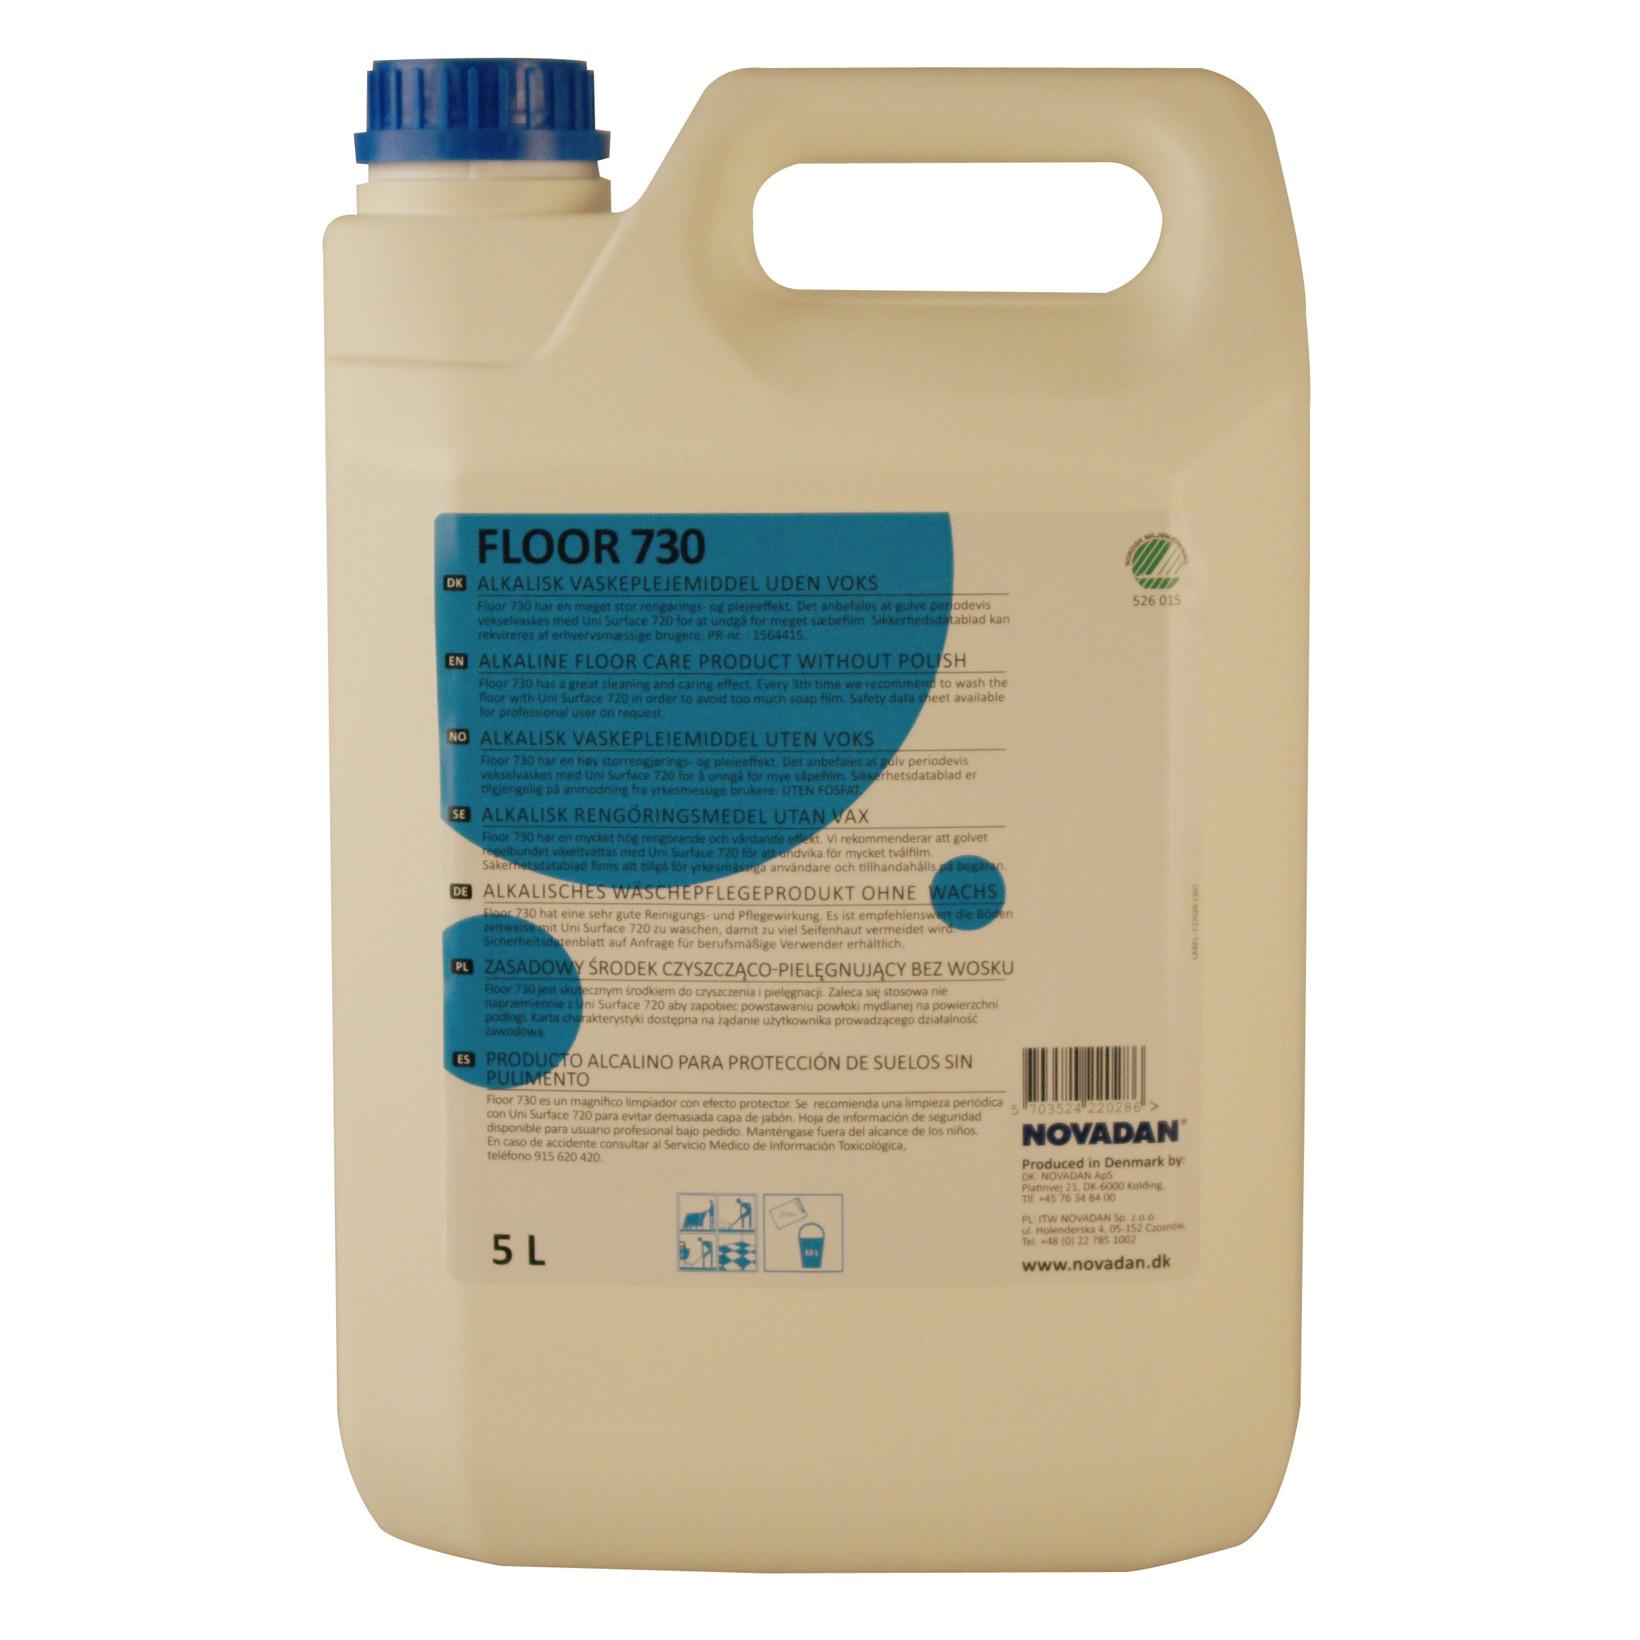 Novadan Floor 730 Gulvpleje - 5 liter